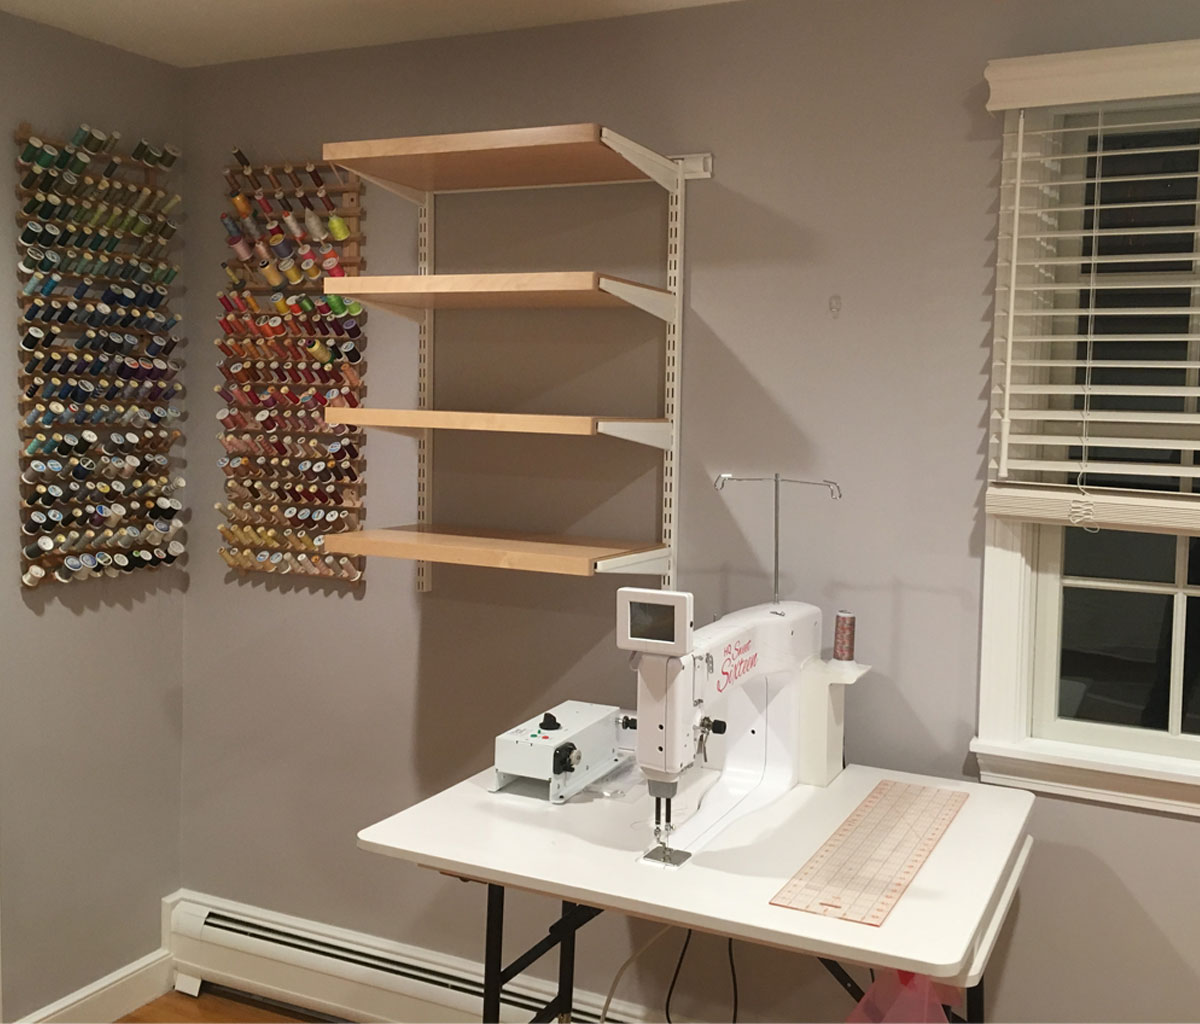 Hadi-Quilter Sweet 16 sewing machine